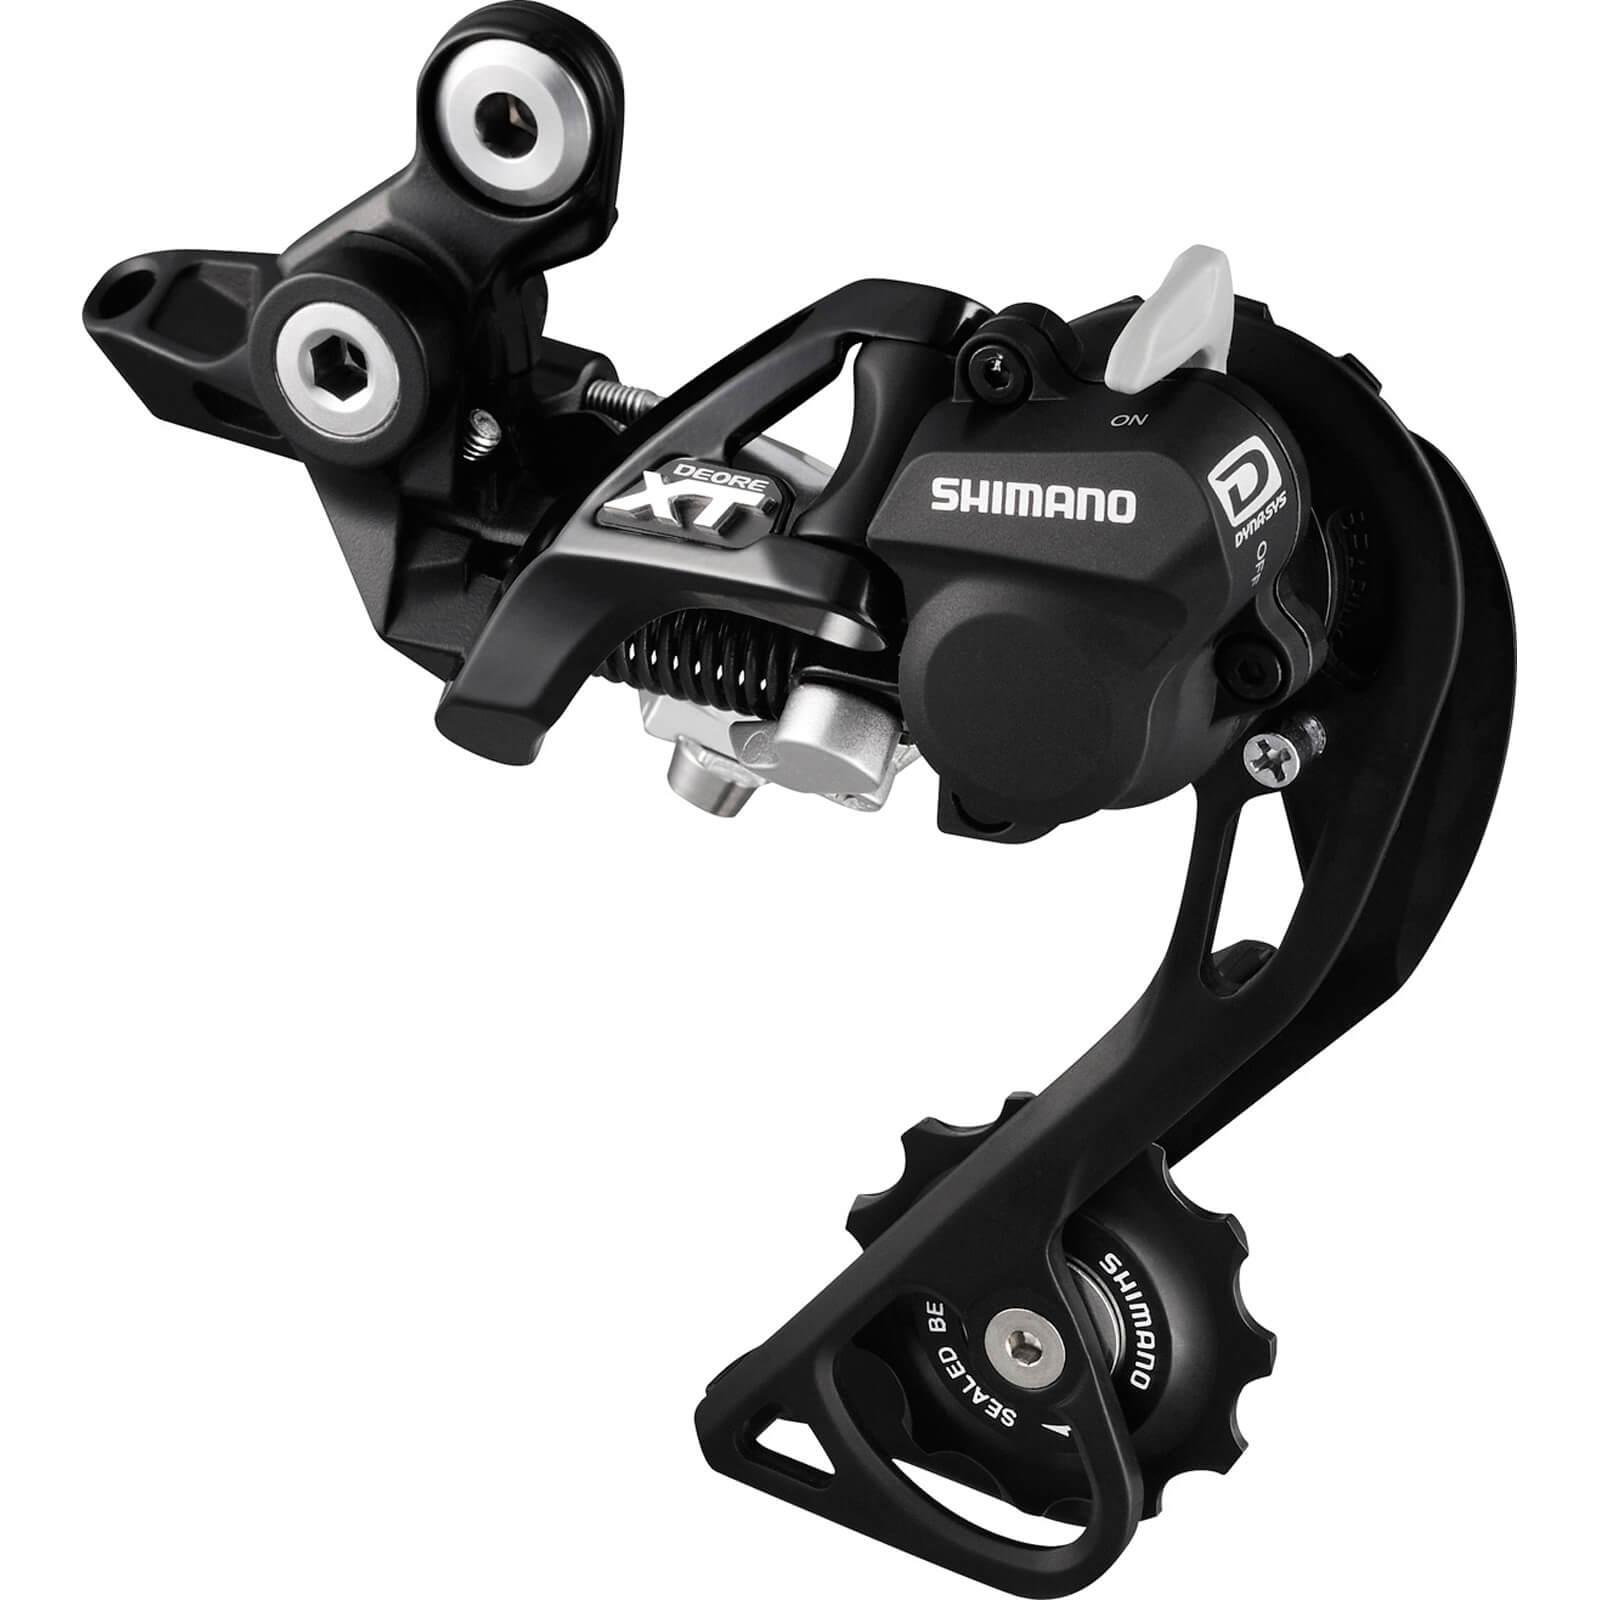 Shimano RD-M8000 XT 11-Speed Shadow+ Design Rear Derailleur - Black - Medium Cage